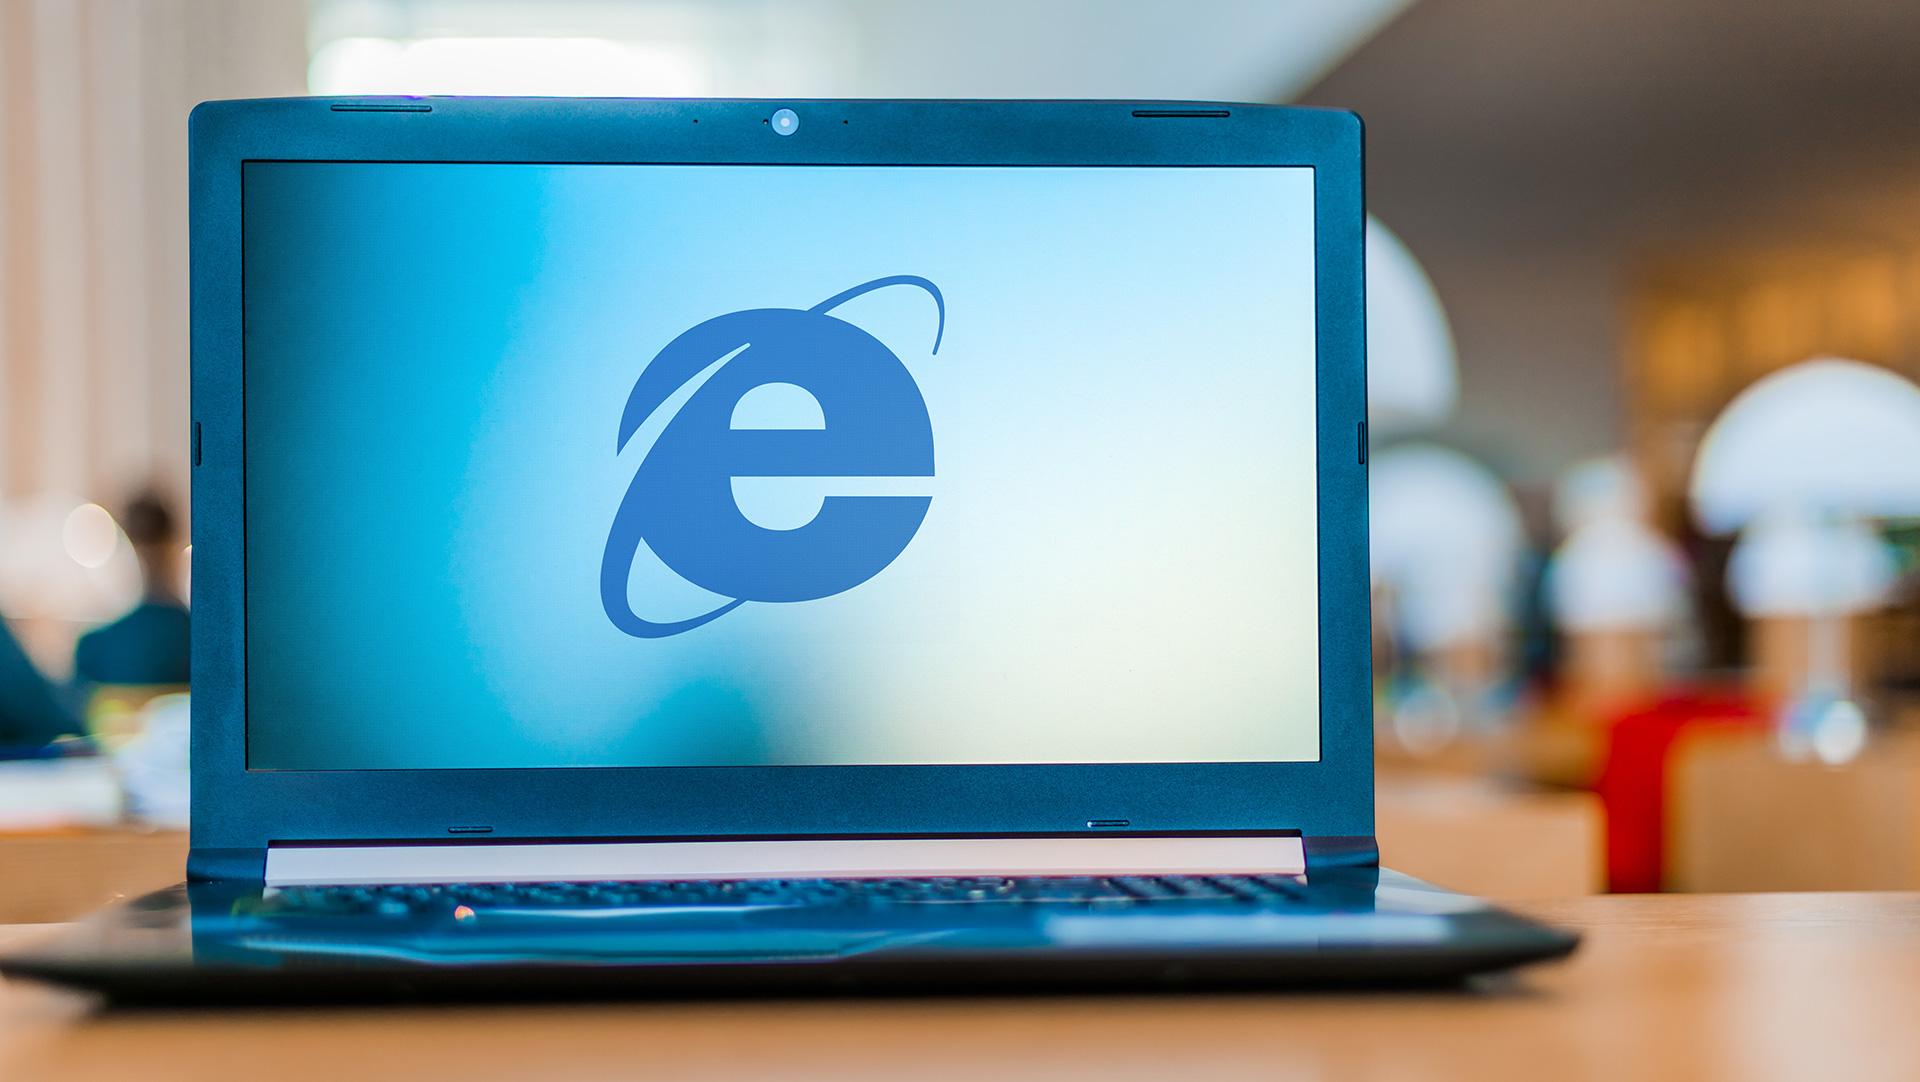 Microsoft Internet Explorer / Microsoft Edge